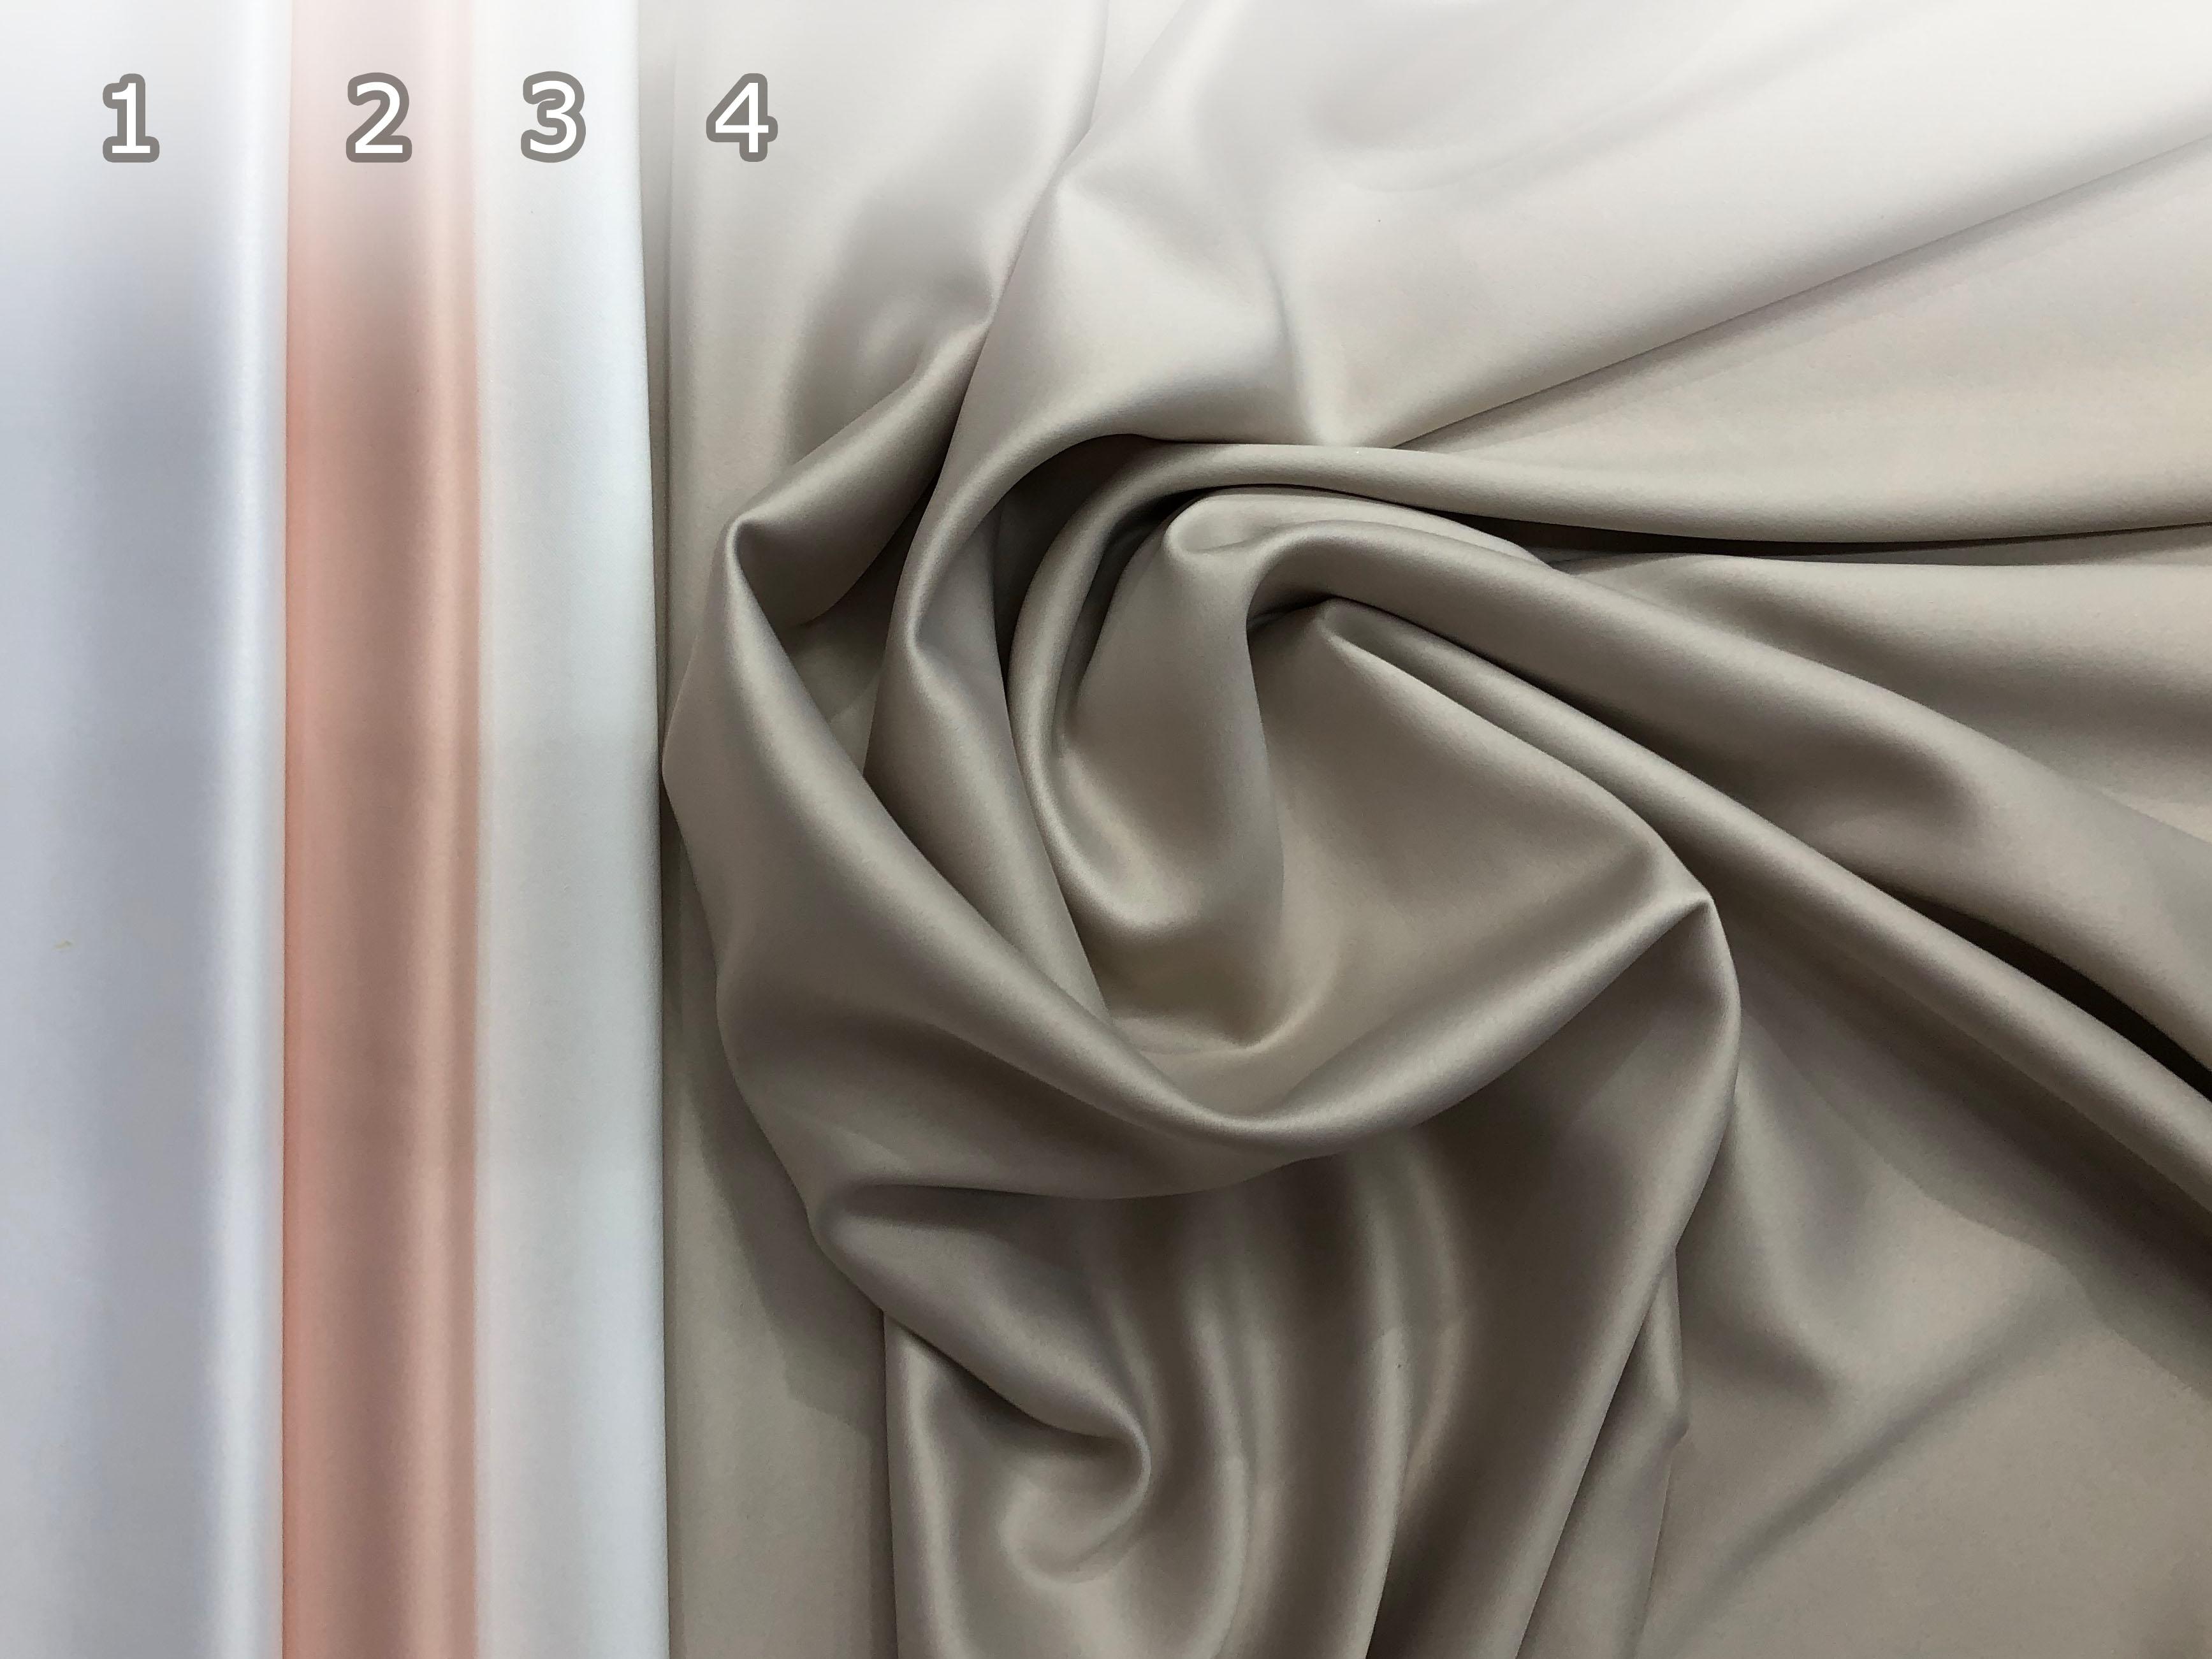 https://raduga-stex.com/images/stories/virtuemart/product/Gabana.jpg